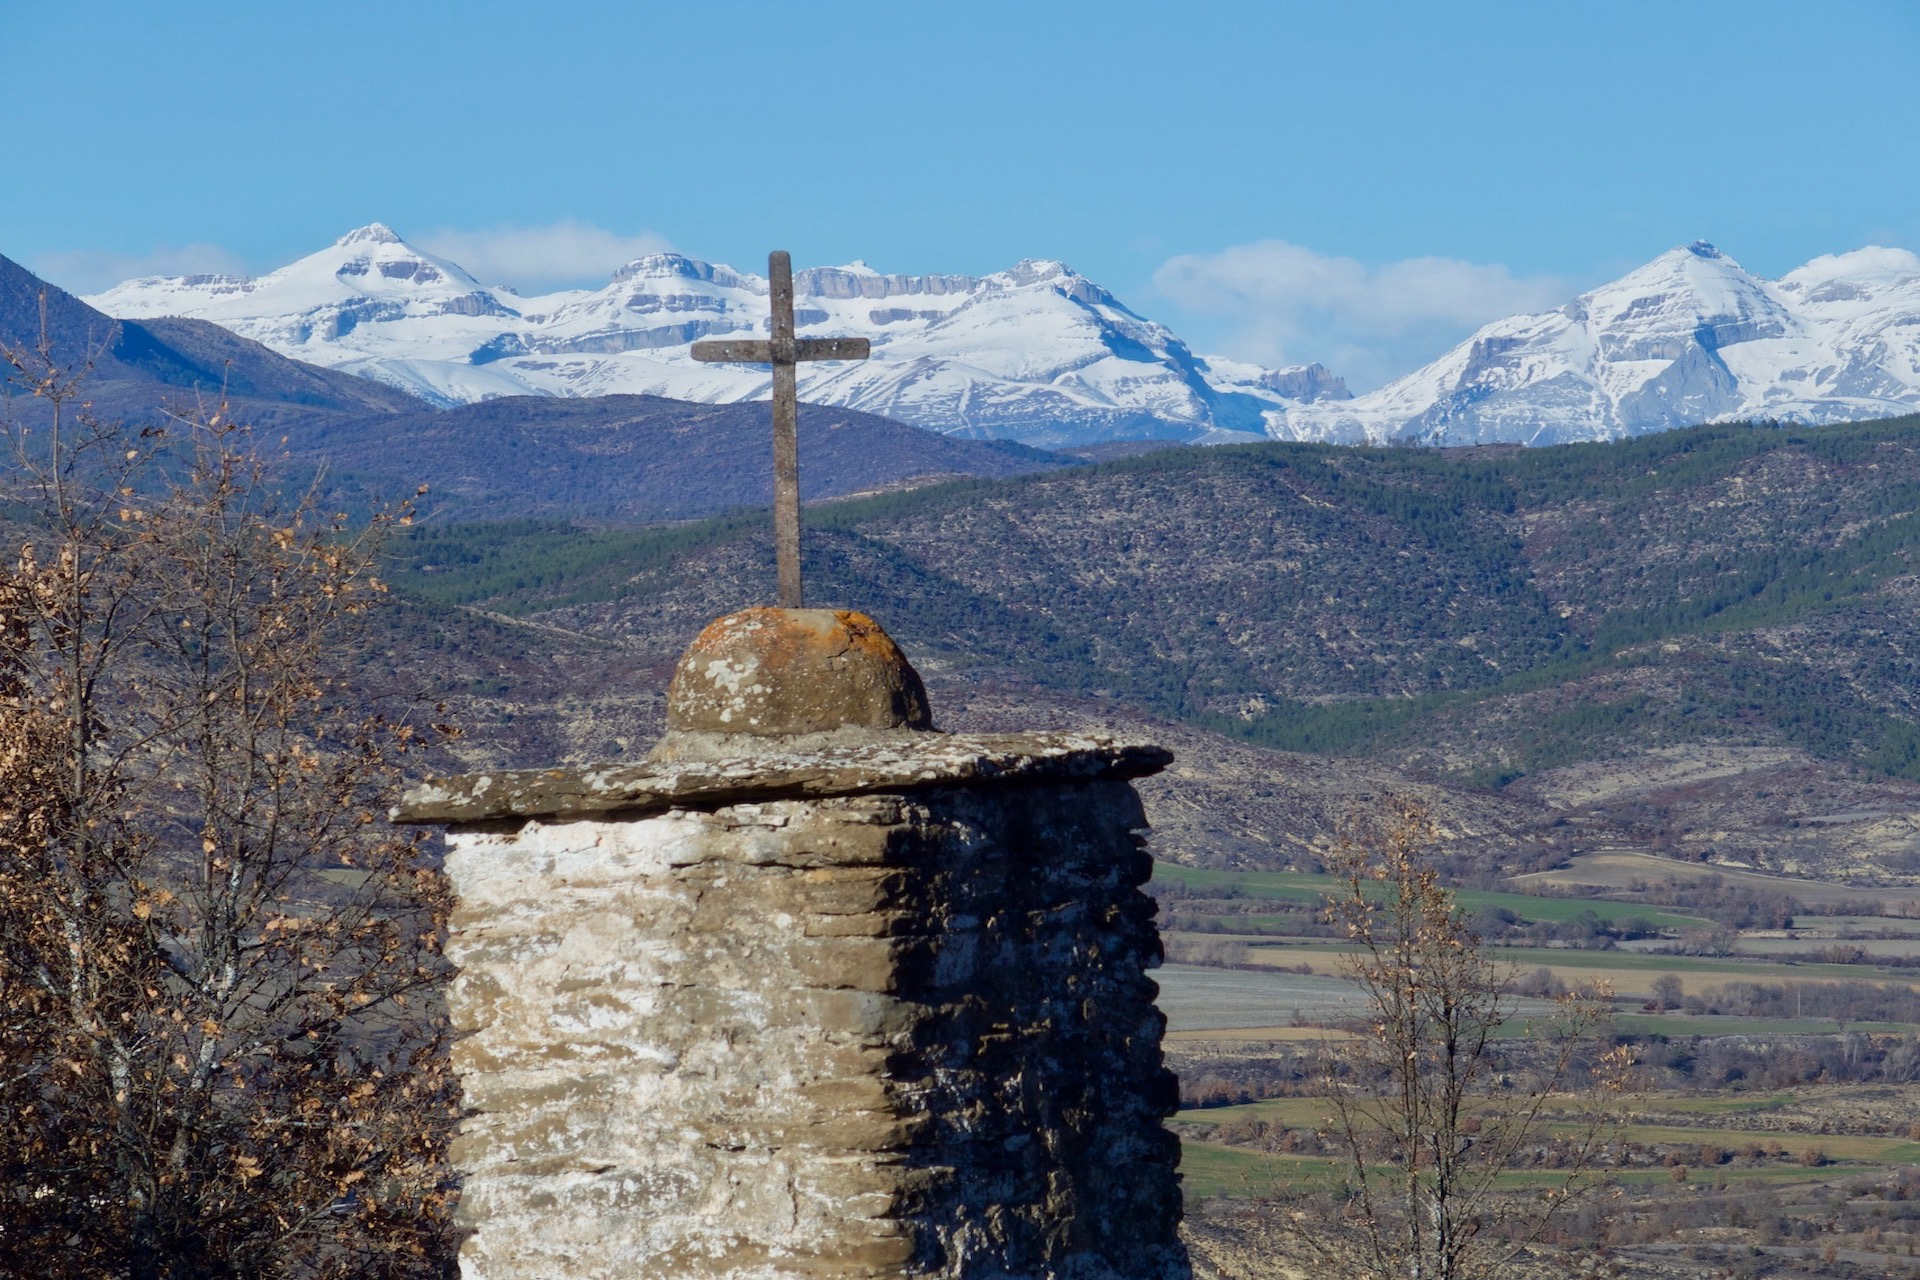 Camino Aragones - Pyreenees views